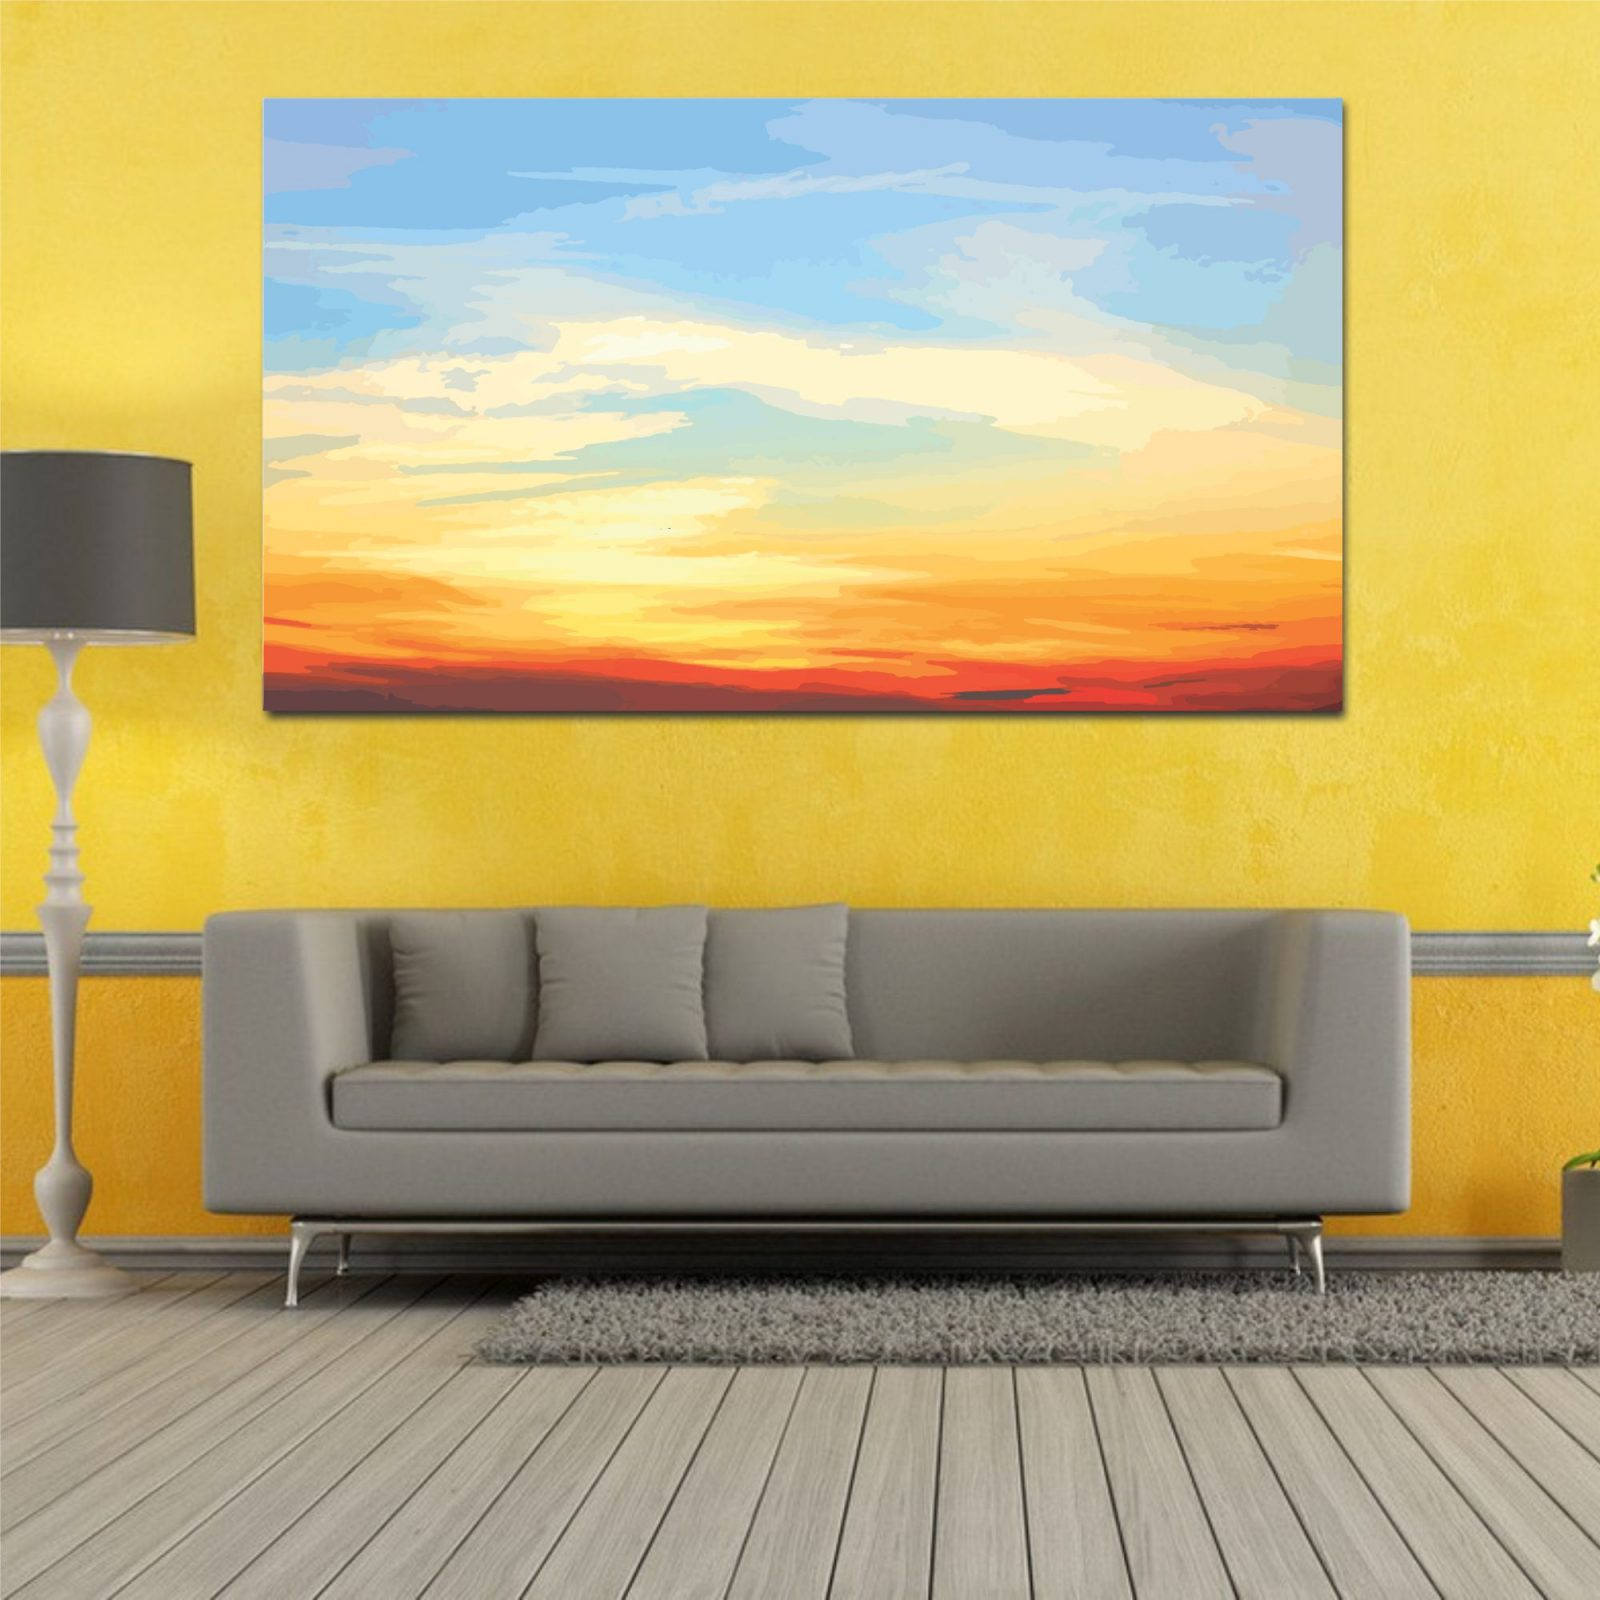 skyline-abstract-wall-art-canvas-print-1600x1600